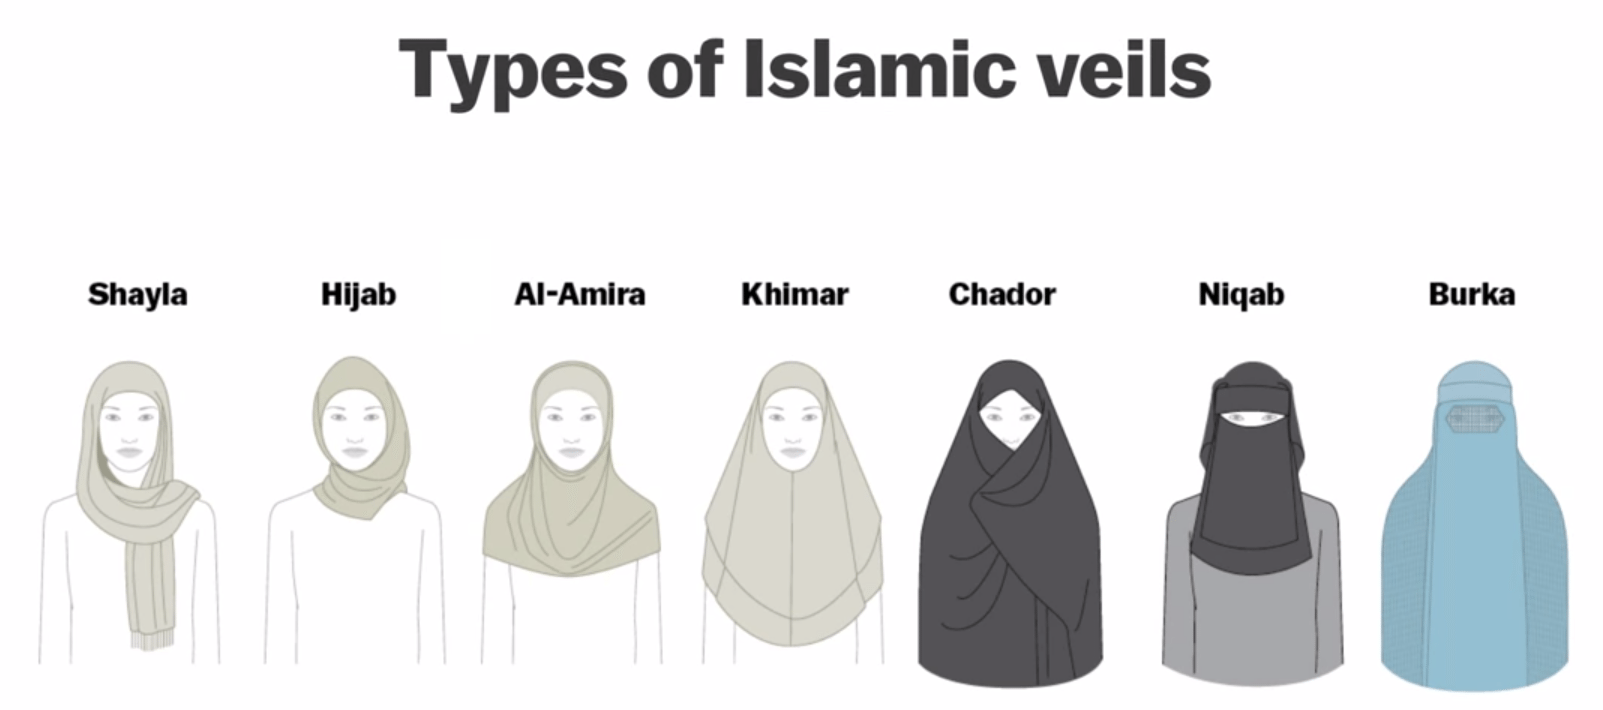 Types of Islamic veils